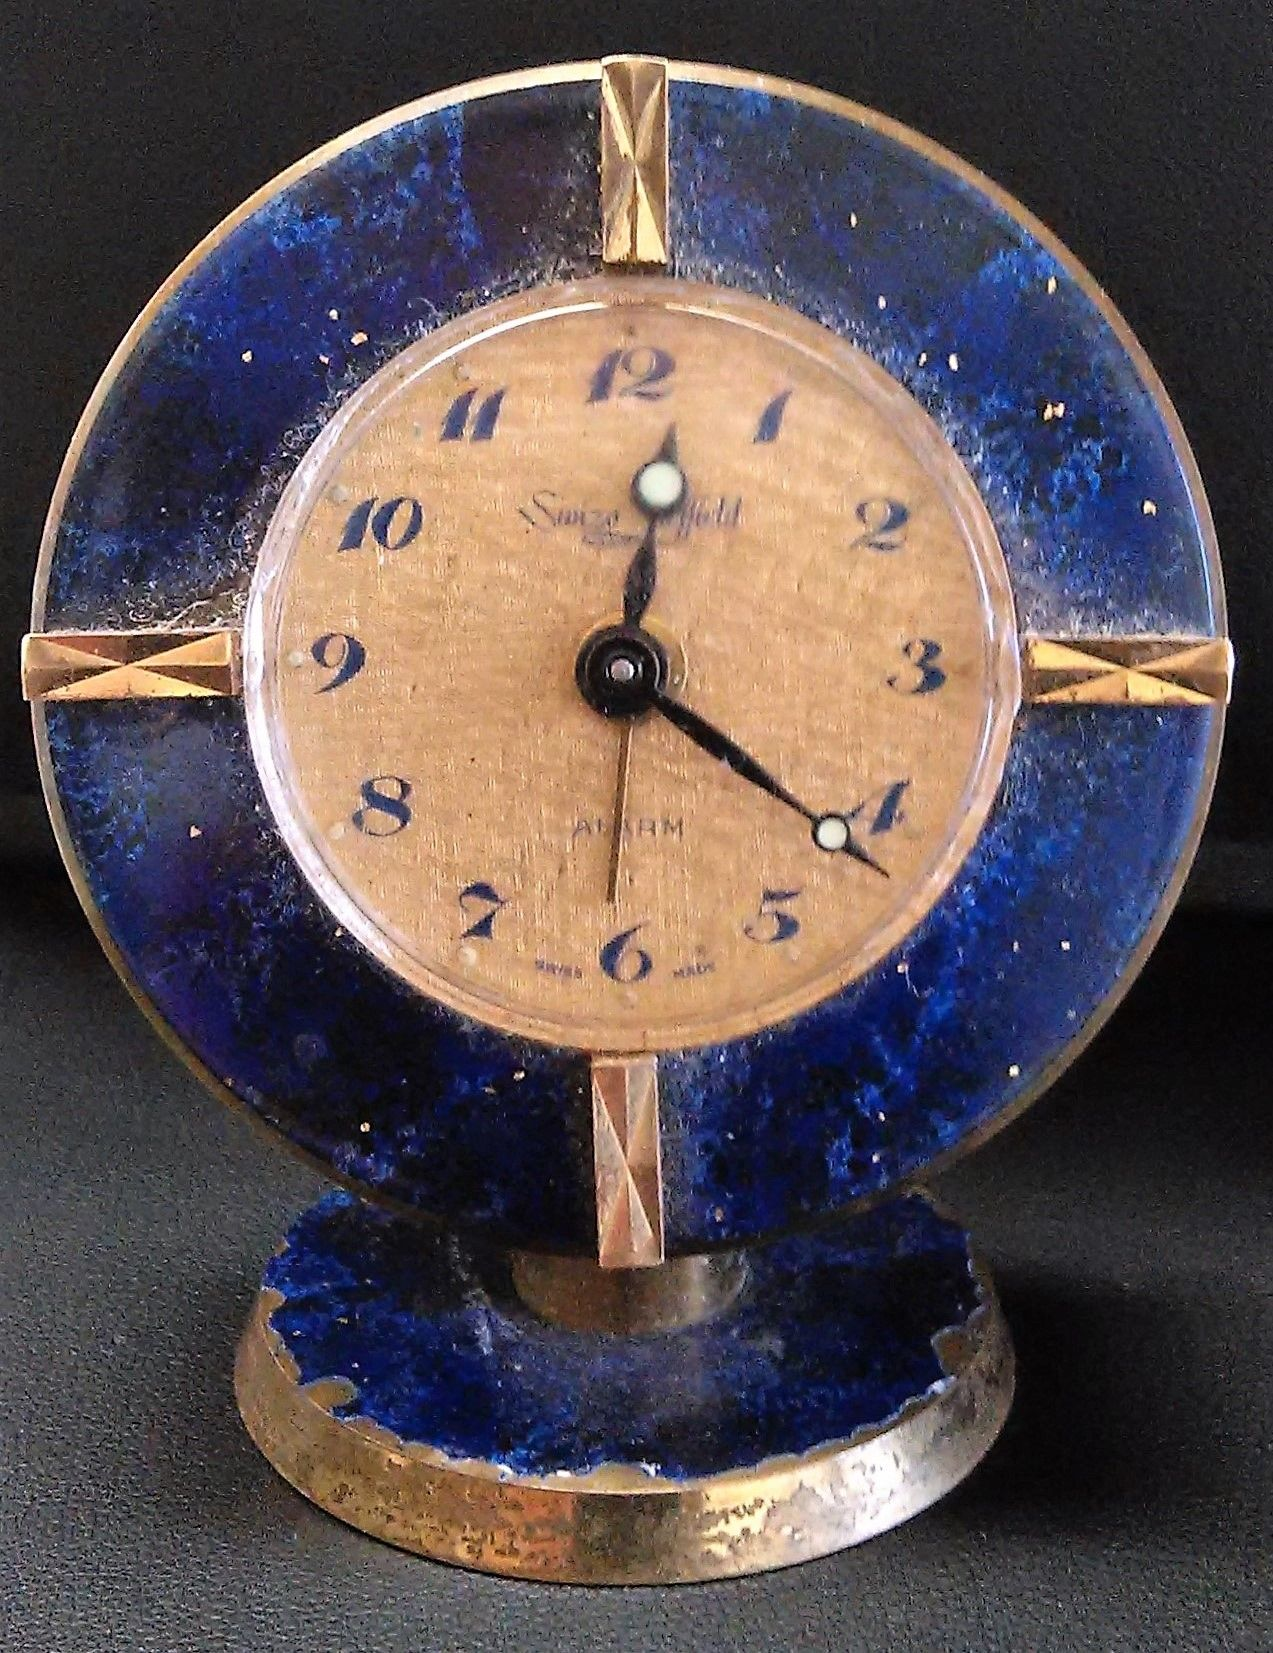 Vintage Clock Repair Of The Week 1950 S Swiza Sheffield Wind Up Alarm With Blue Ceramic Bezel